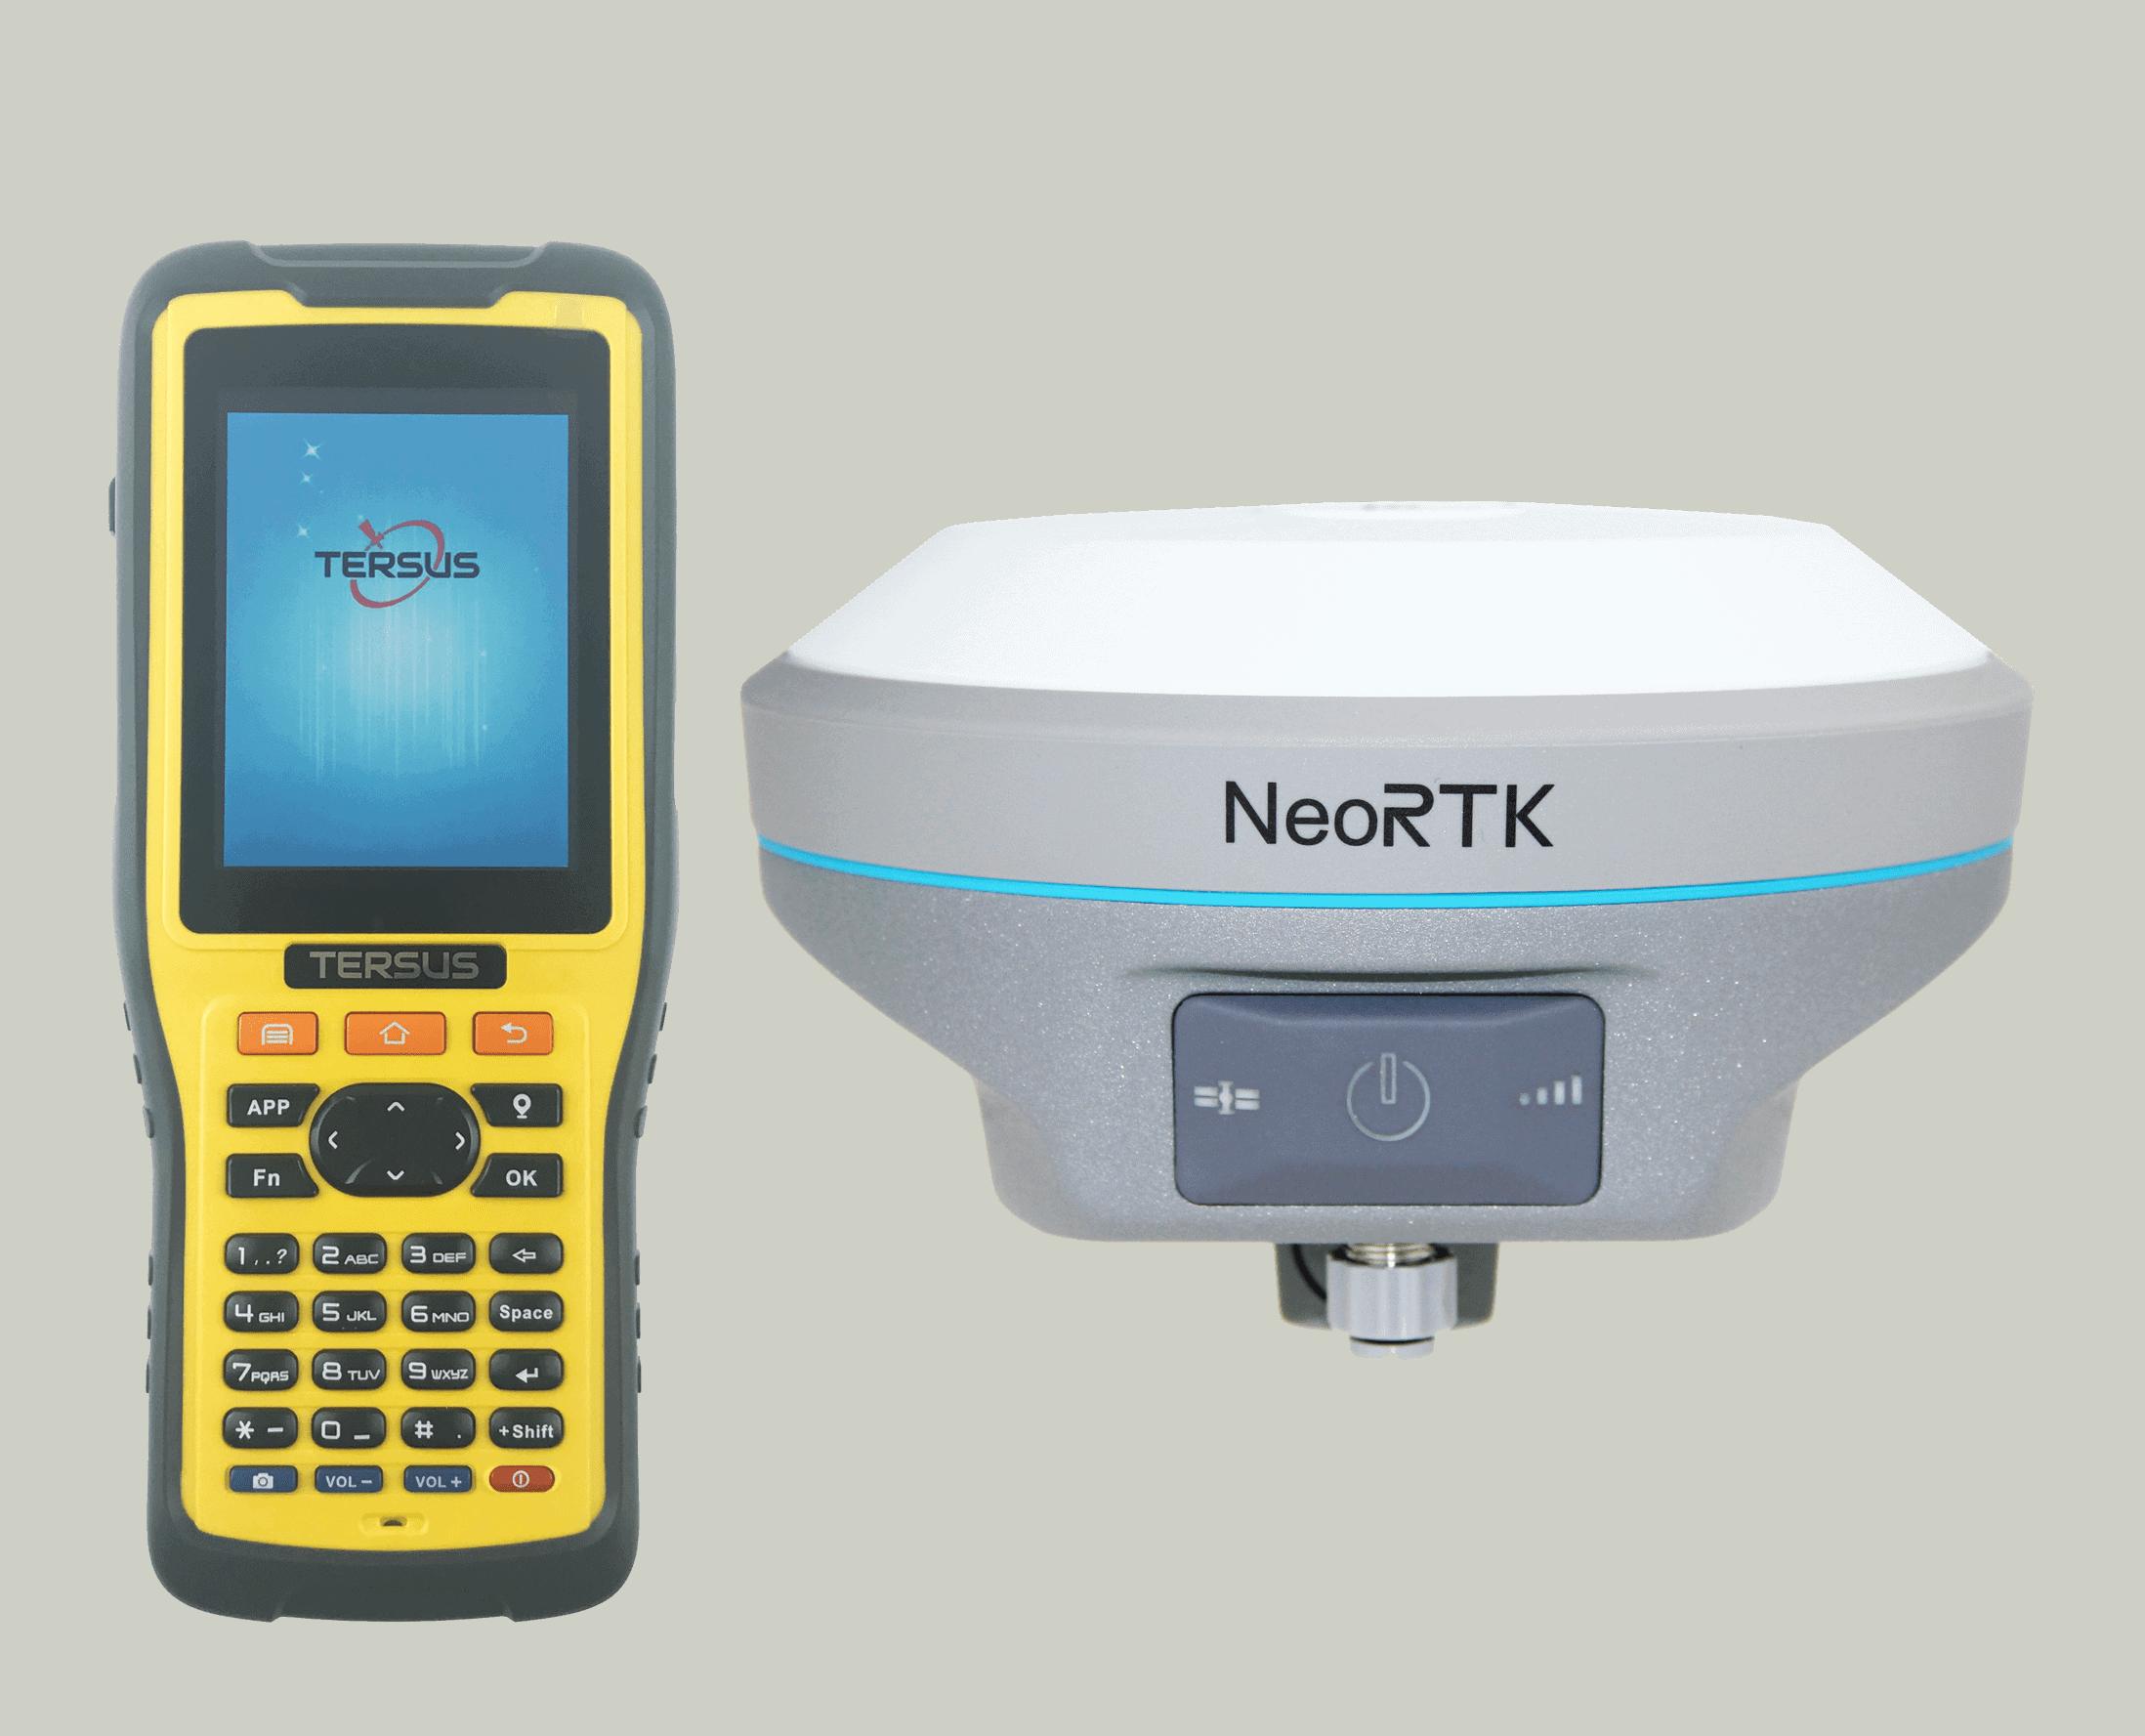 NeoRTK GNSS RTK System